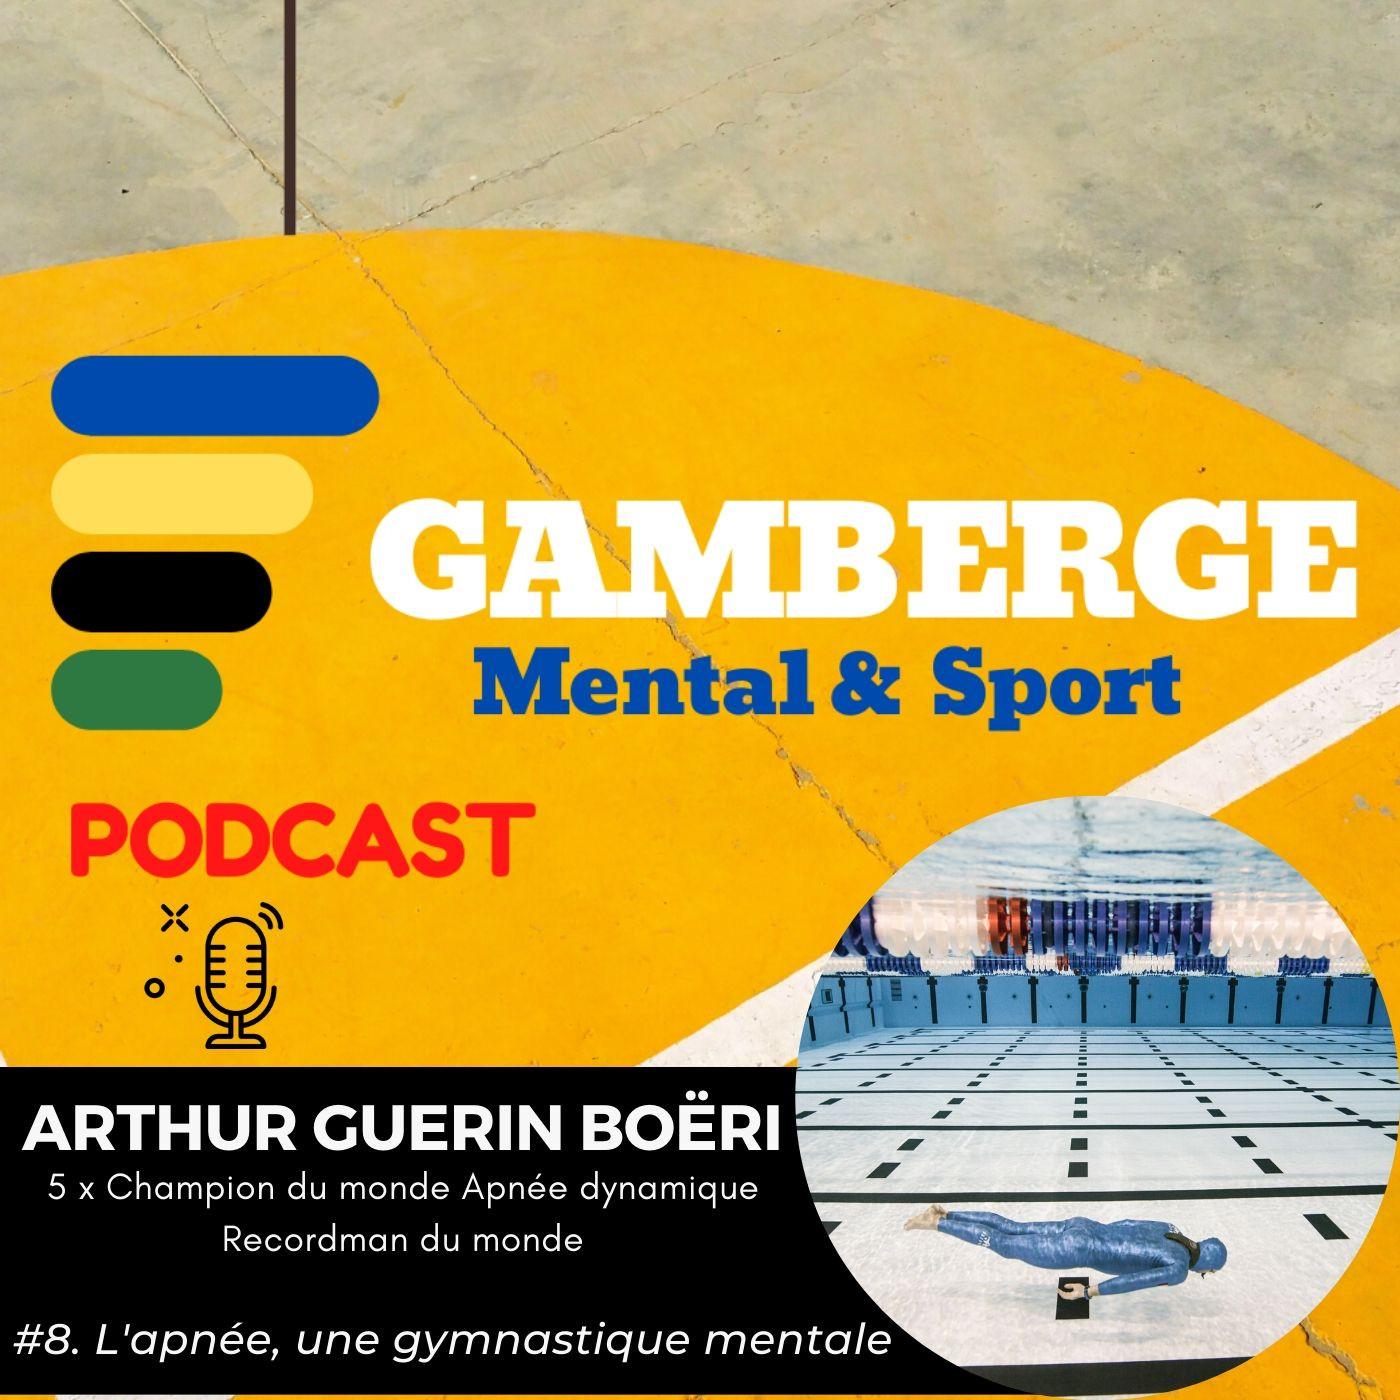 #8. Arthur Guérin Boeri: l'apnée, une gymnastique mentale